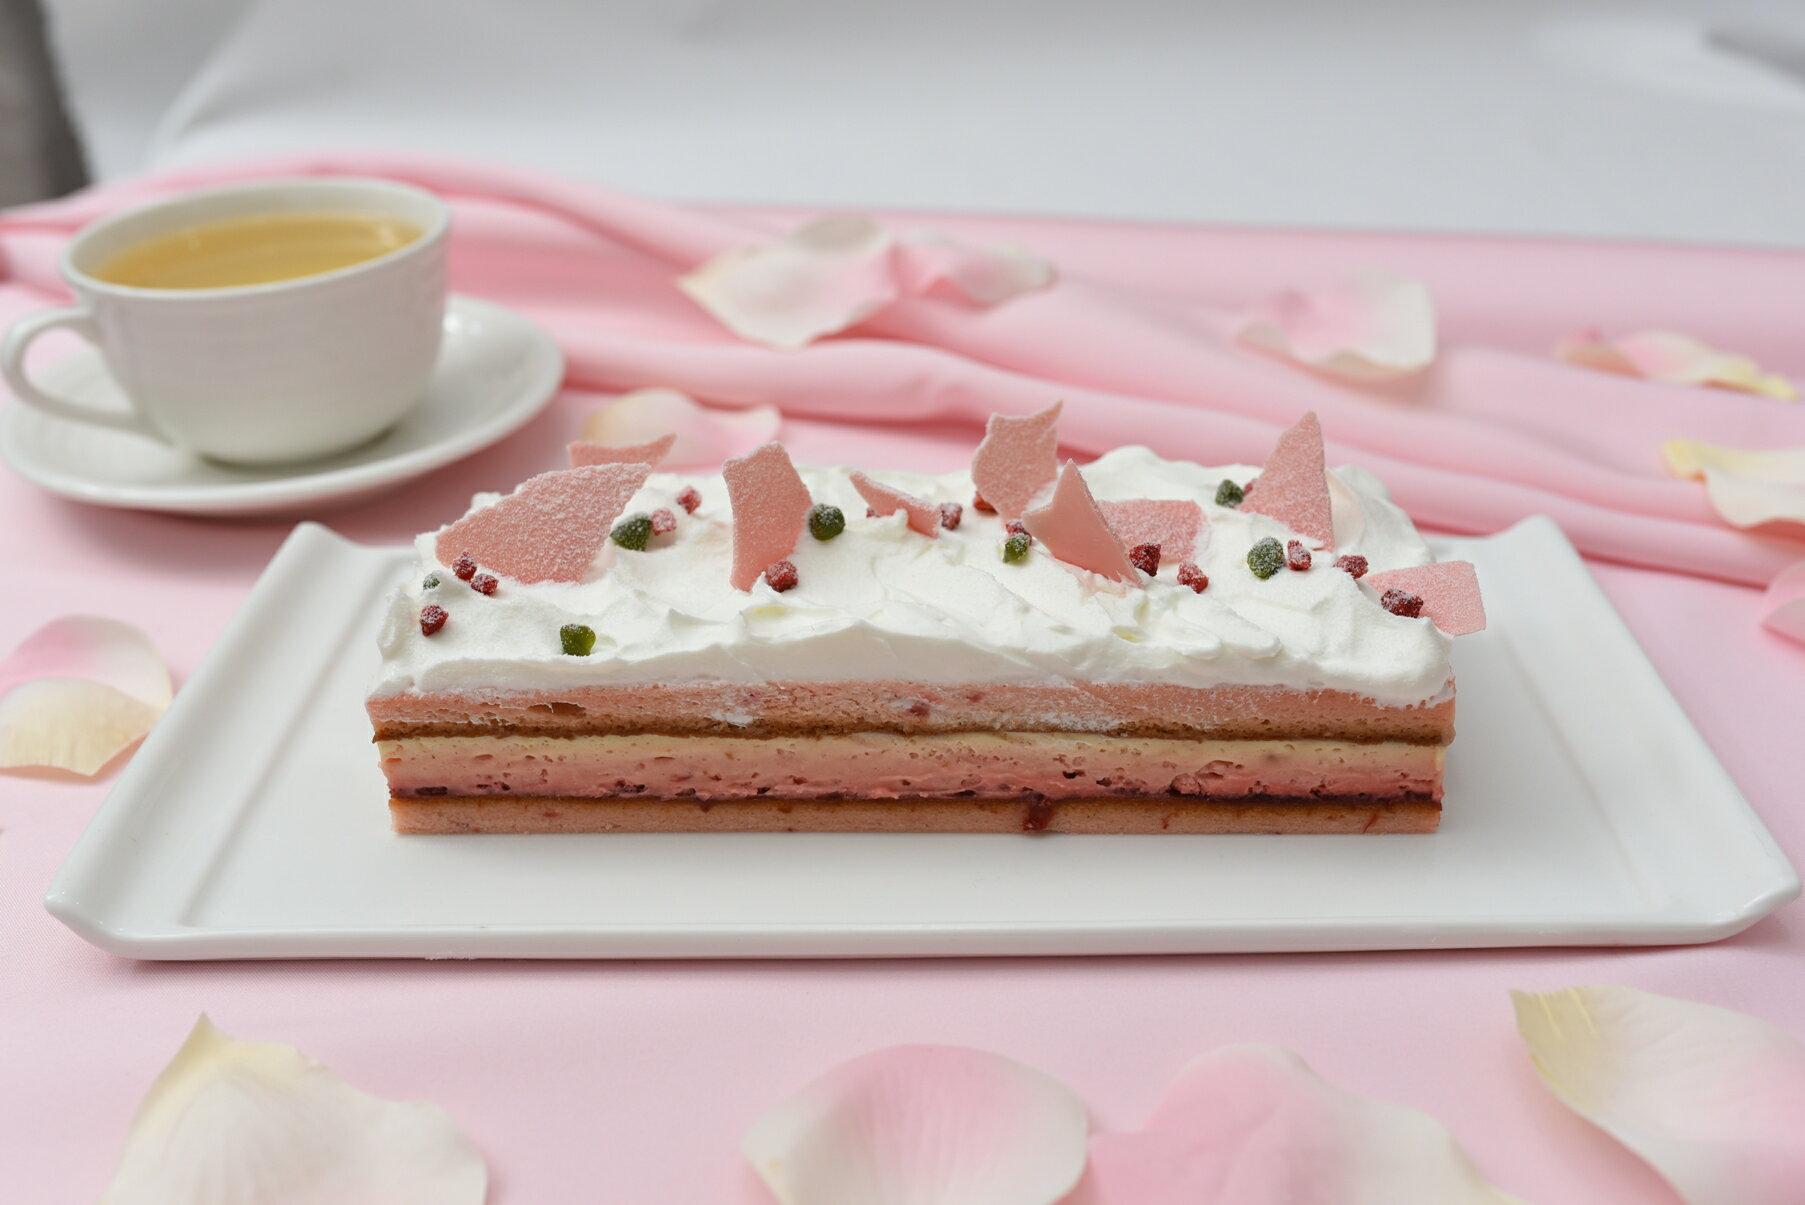 【Emma's】草莓雪藏❤350g❤美國皇家草莓內餡搭配卡士達鮮奶油❤少女心大爆發 2